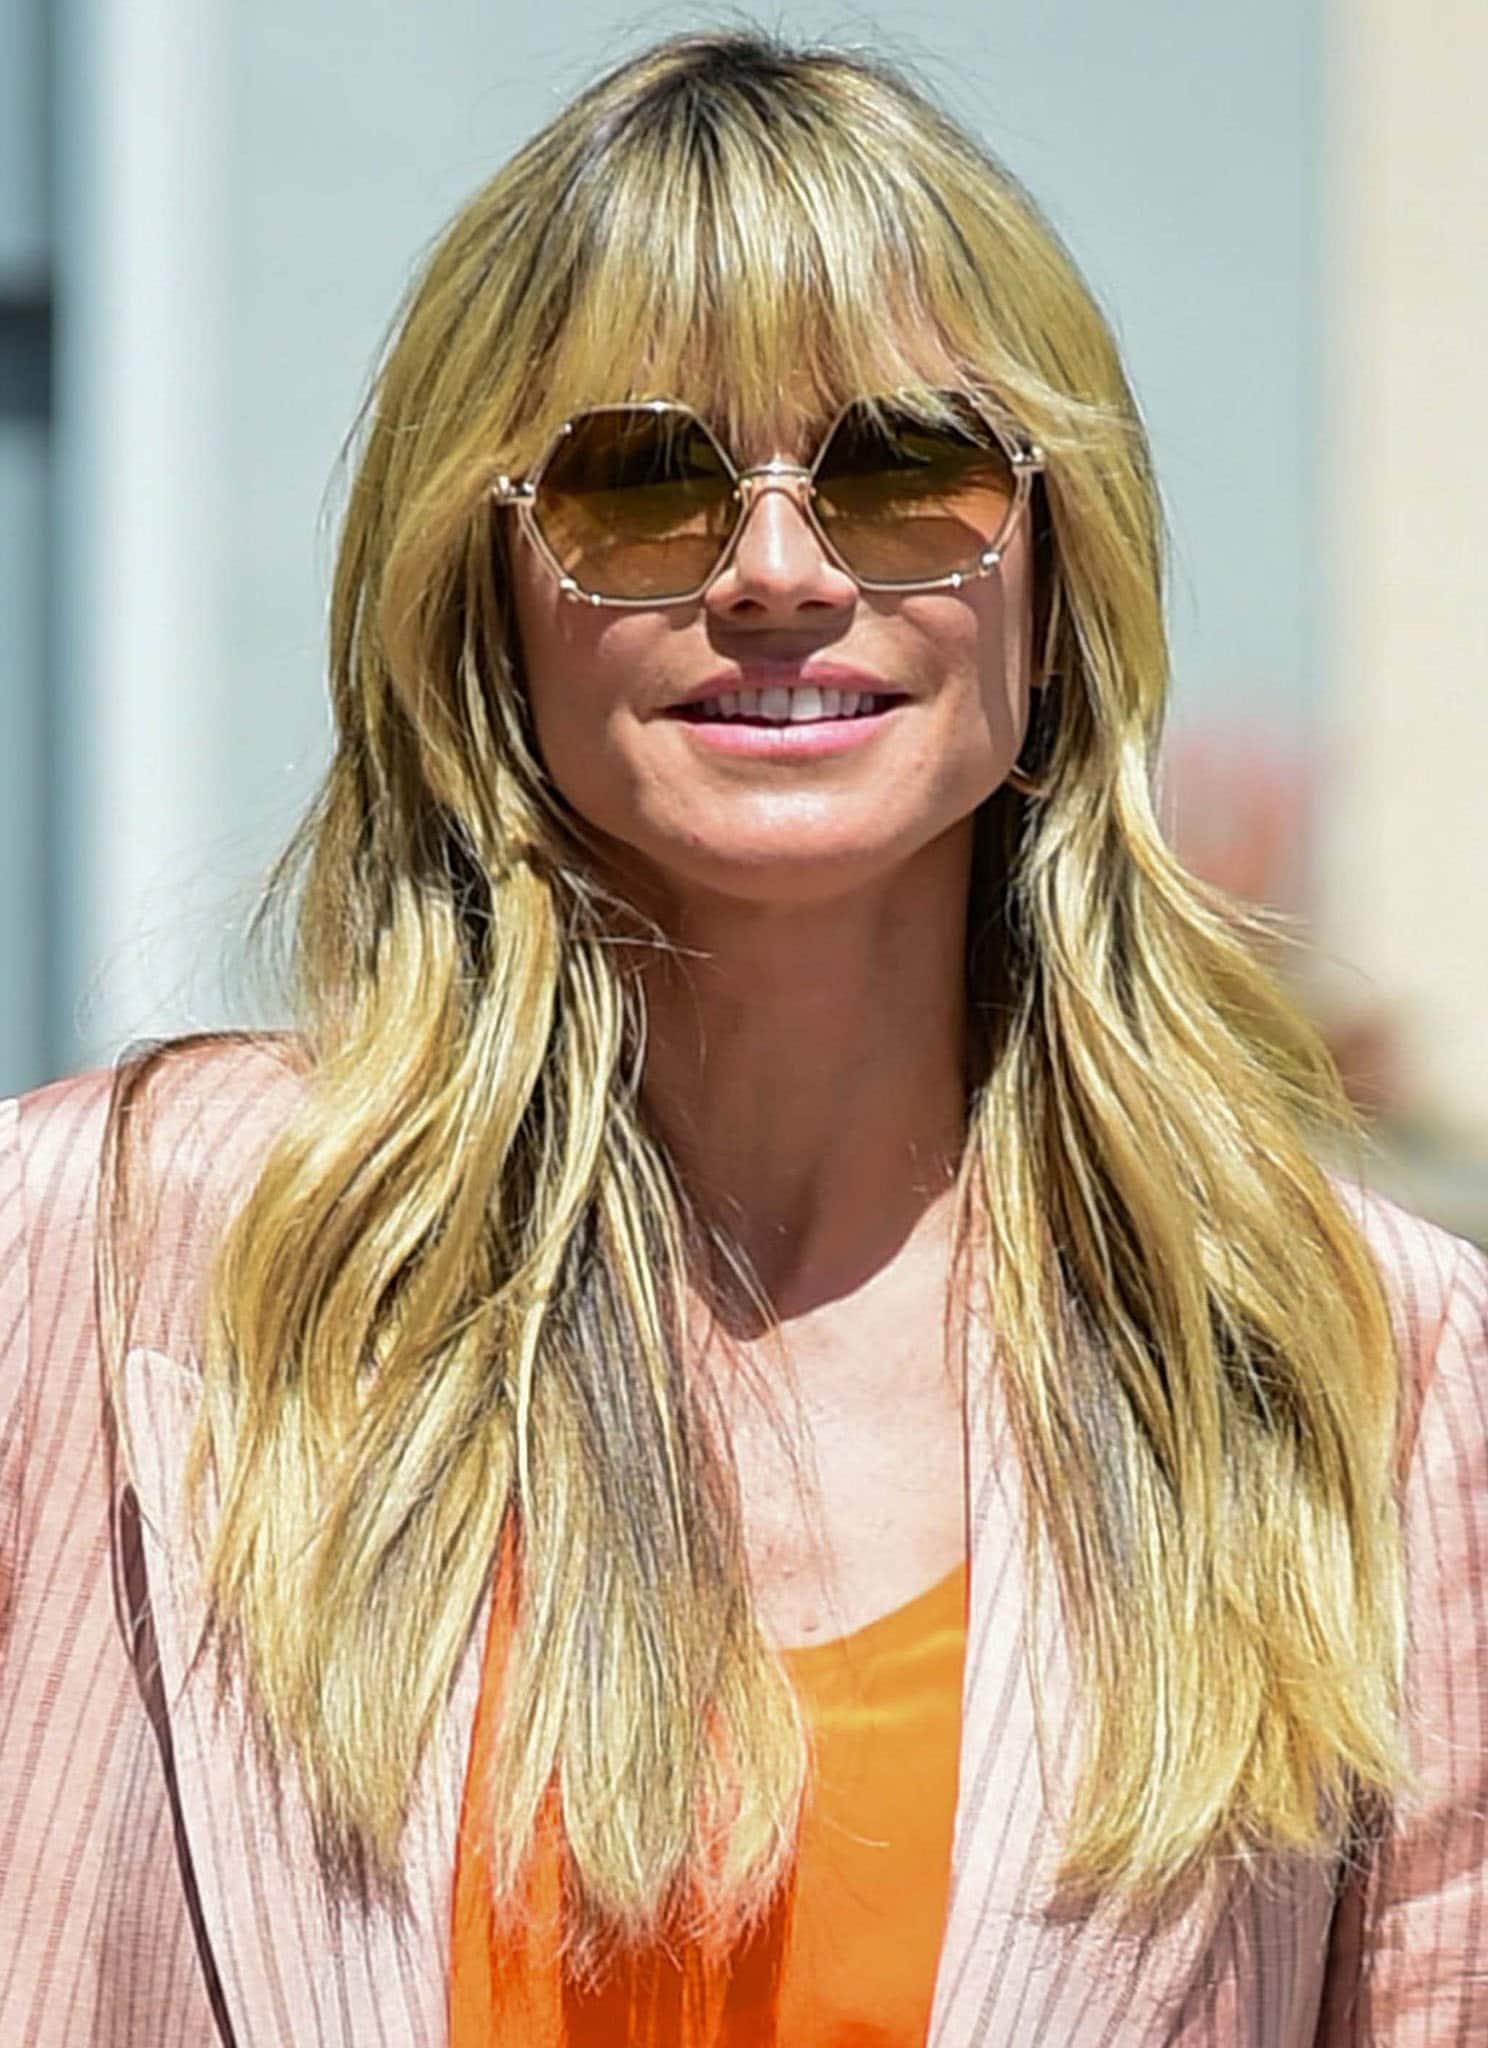 Heidi Klum styles her fringe hair in loose waves and wears a pair of hexagonal sunglasses